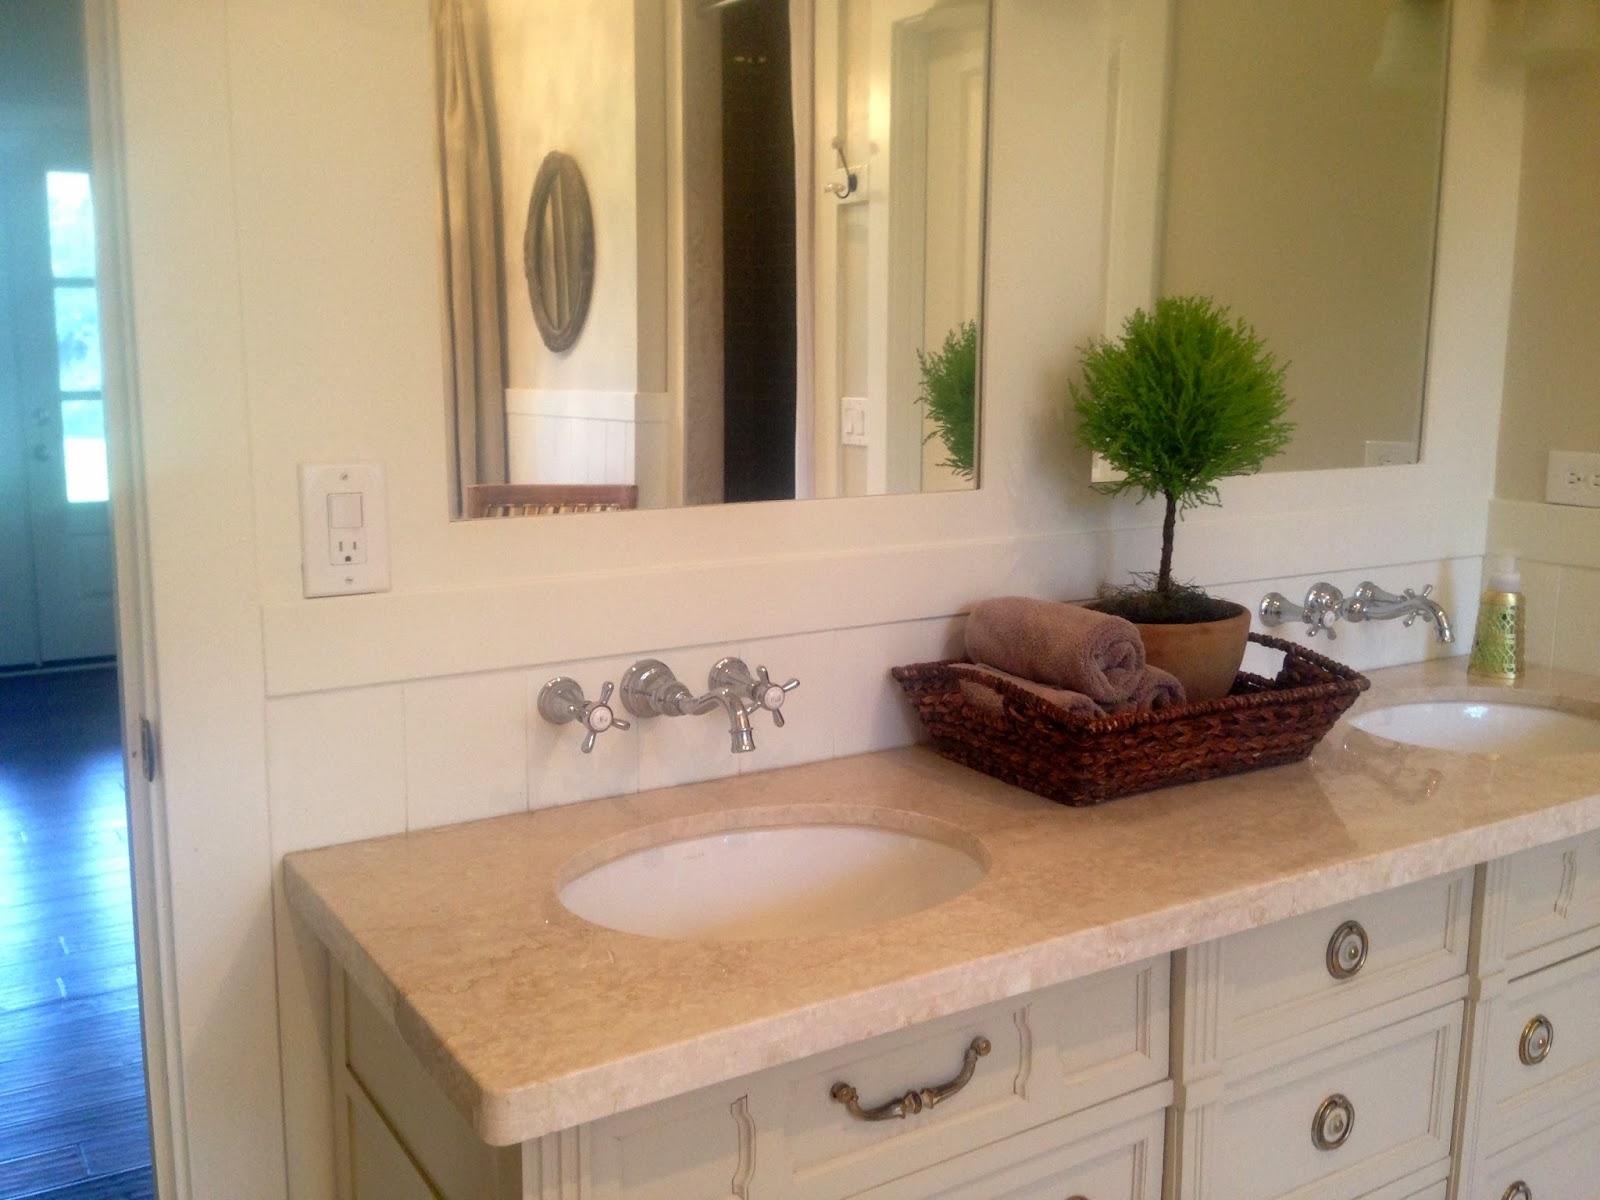 Ranch House Rehab Final Master Bathroom Fixtures